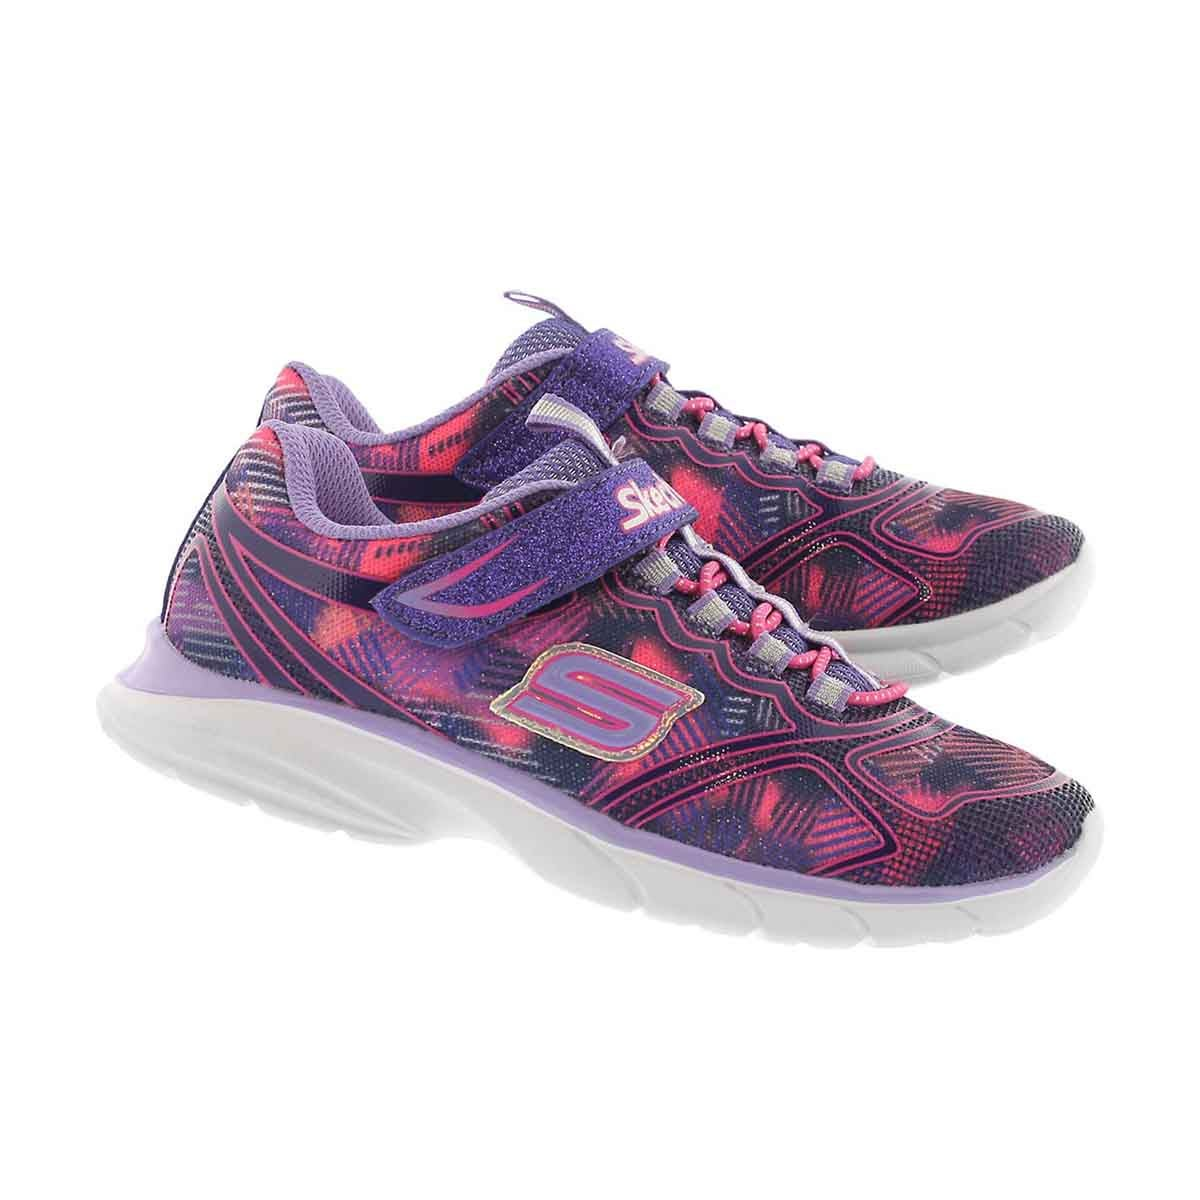 Grls Spirit Sprintz purple sneaker